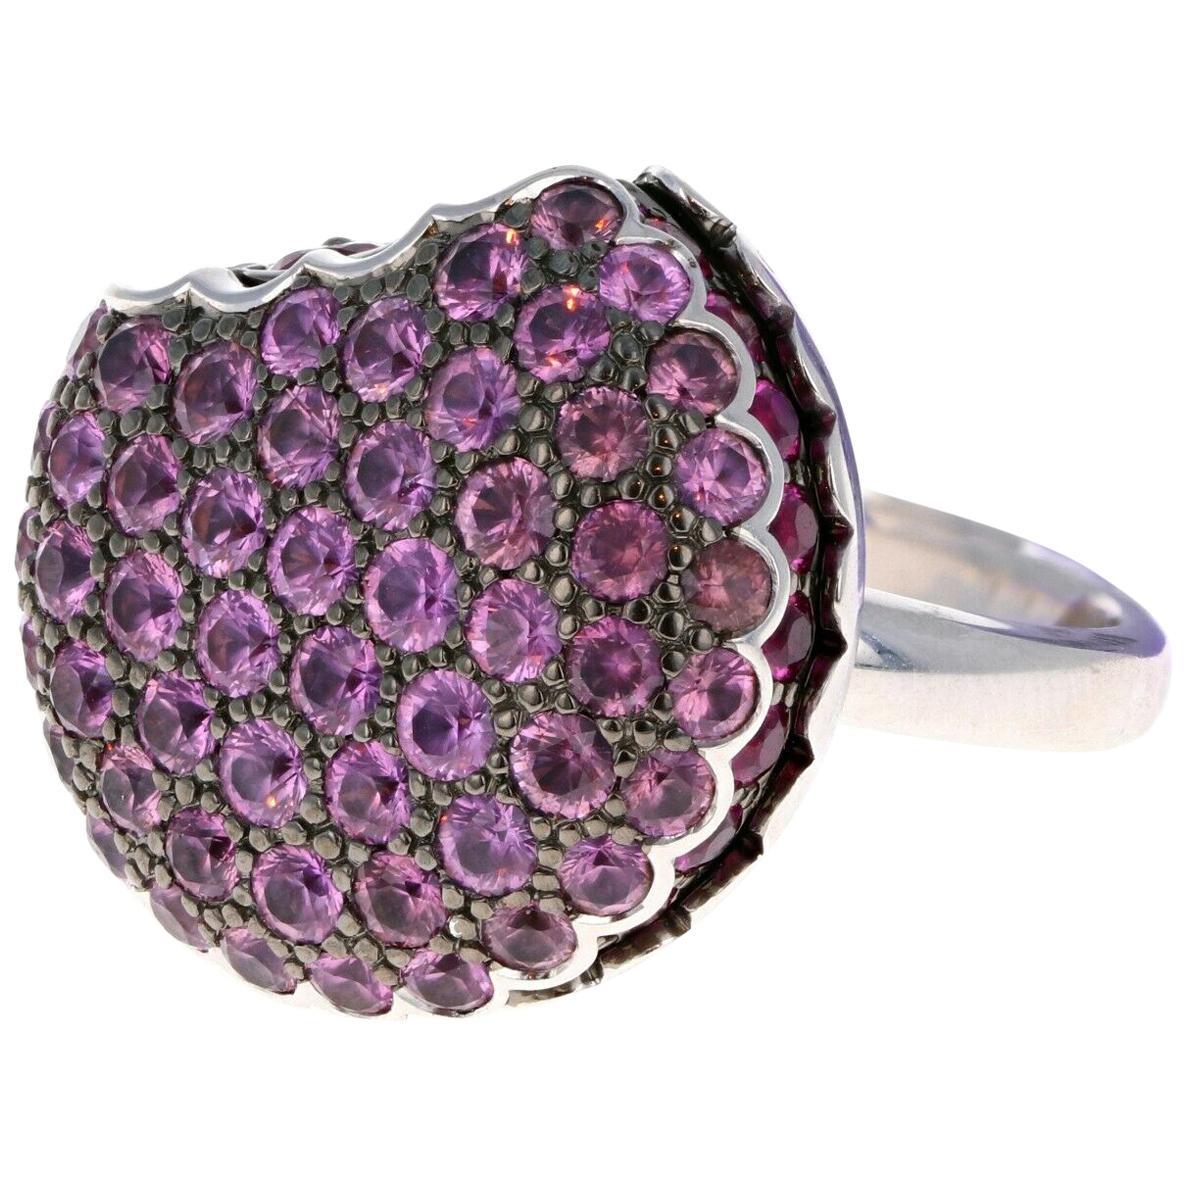 Boucheron White Gold Tentation Macaron Sapphire Ruby Ring